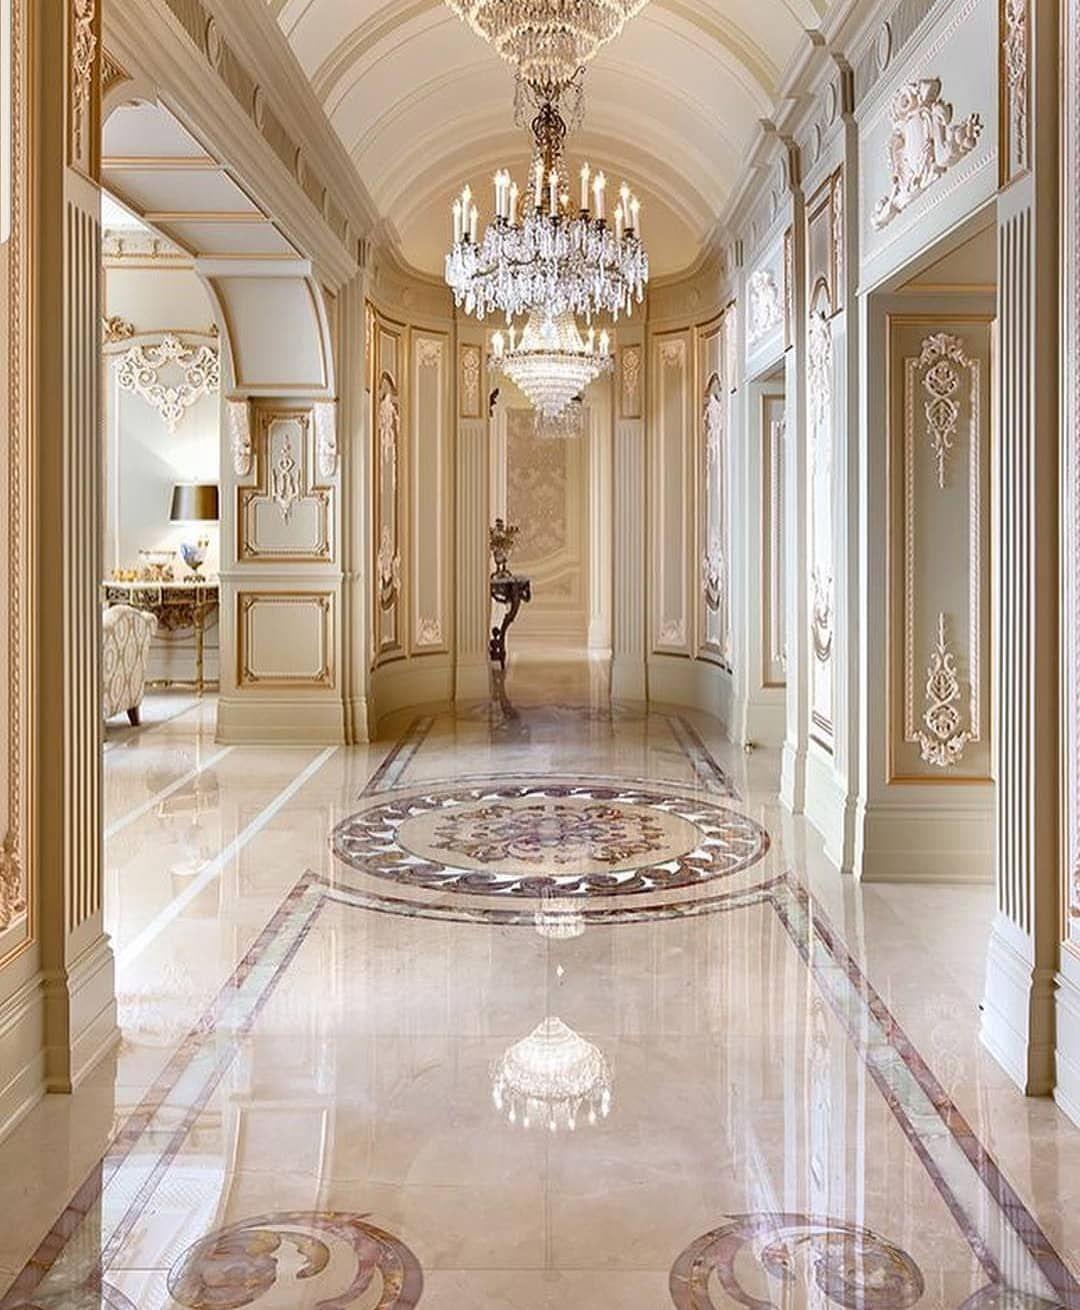 New The 10 Best Home Decor With Pictures صحارى الدولية للديكور مسقط 0096897190870 متخصصون في القصور والفلل والمكات Mansion Interior House House Design